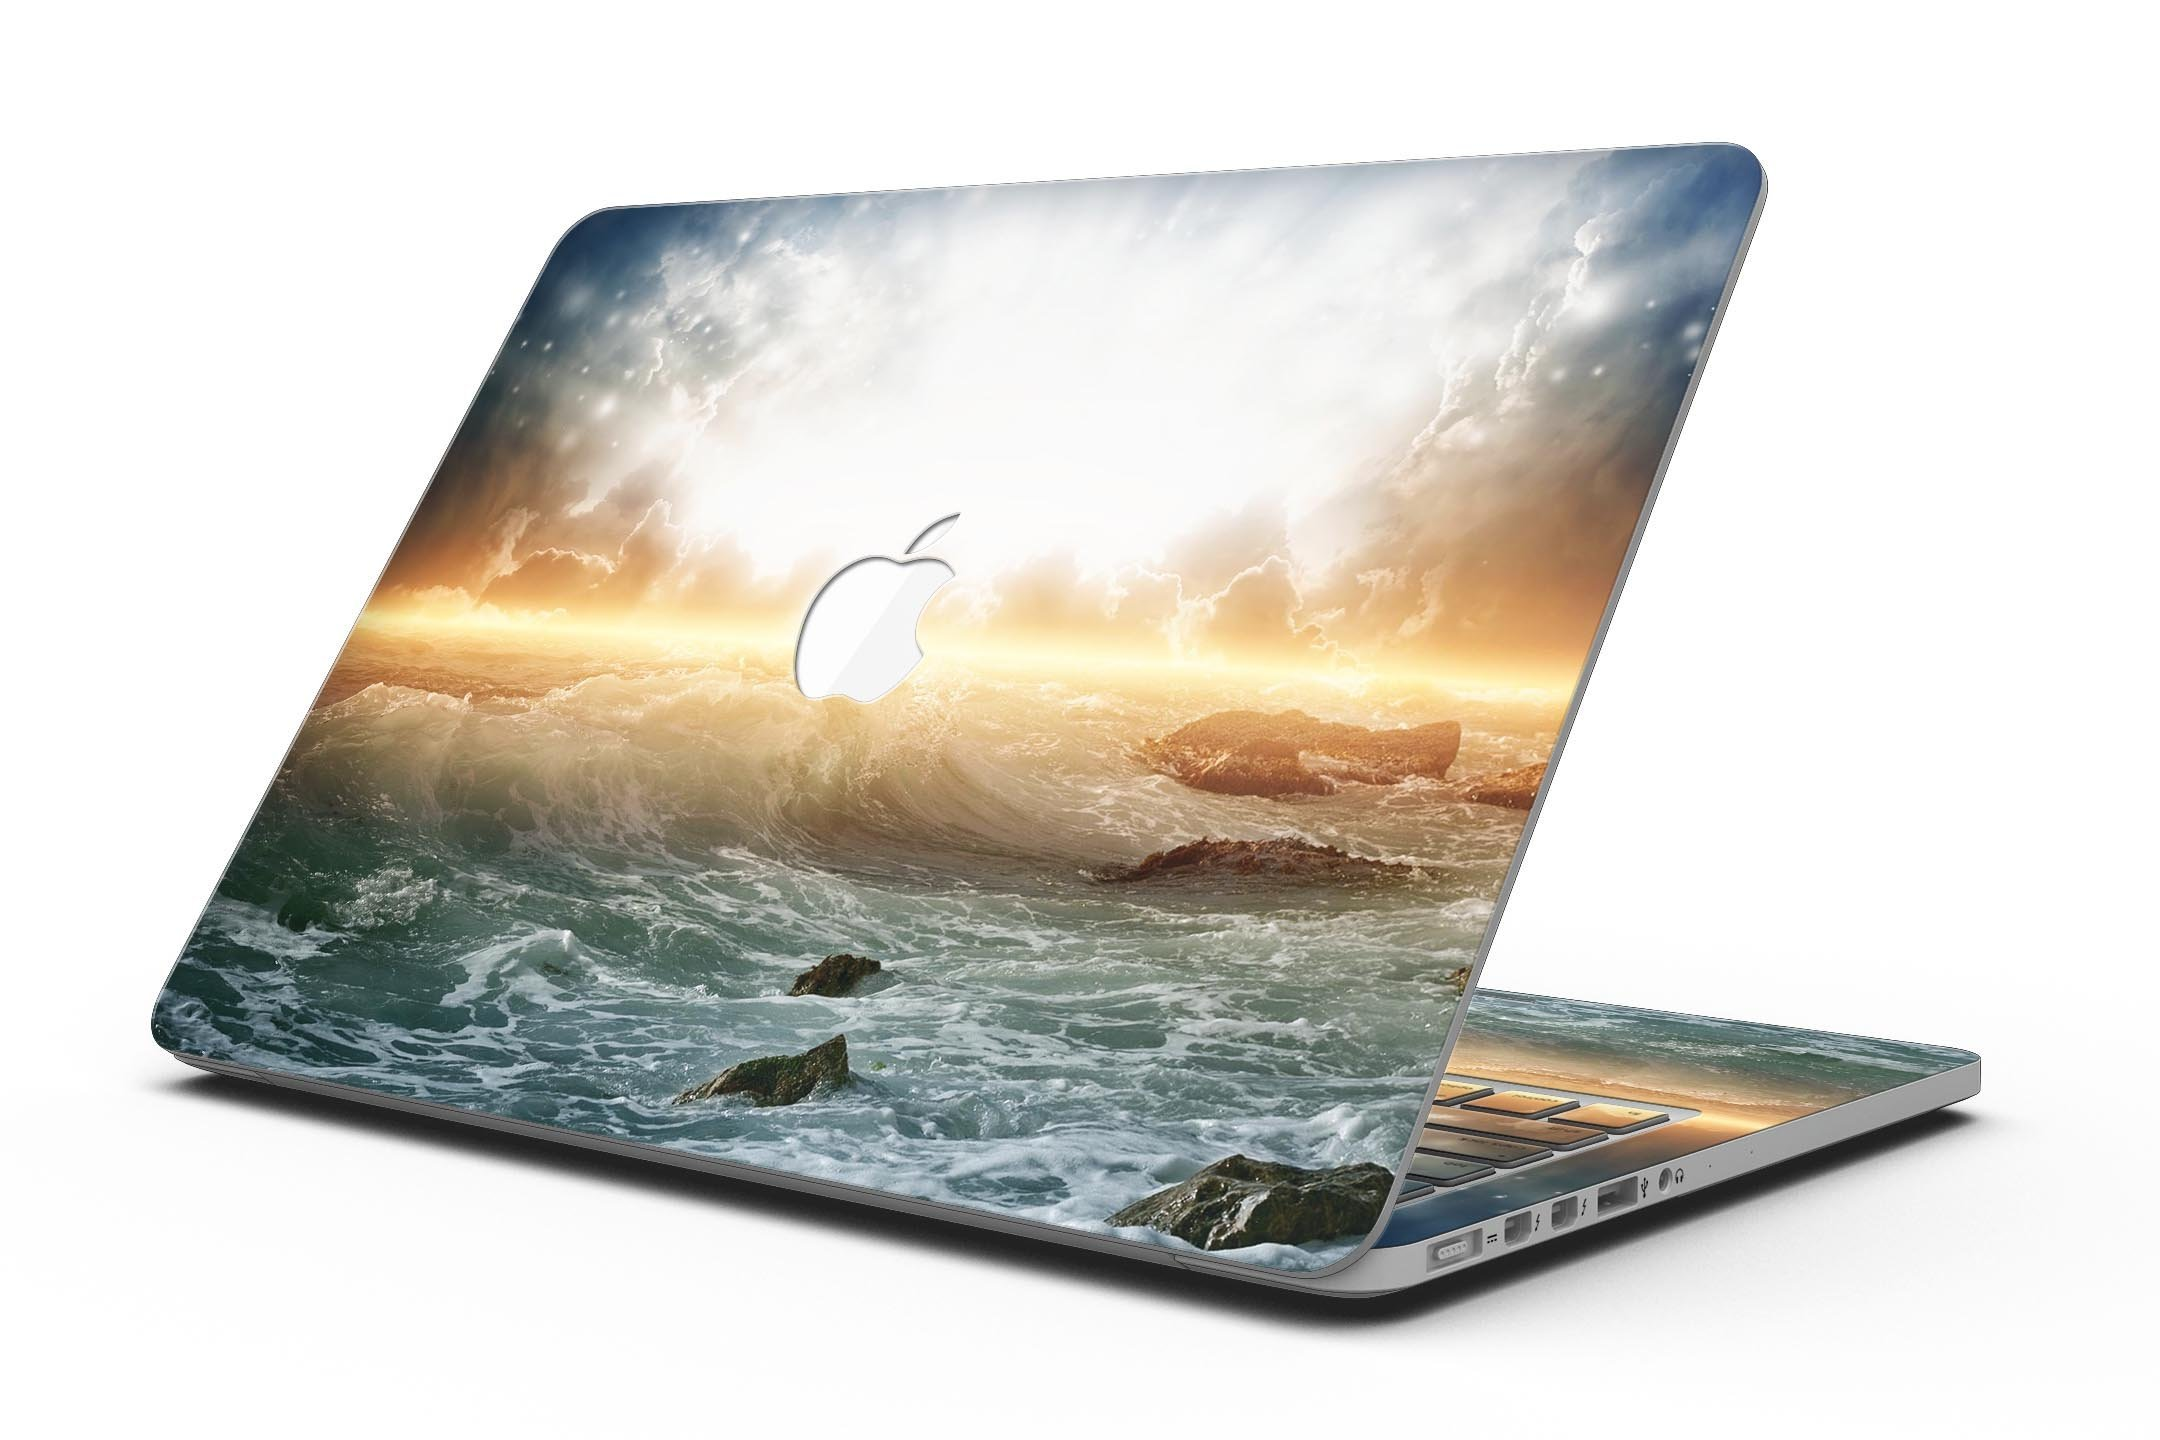 Majestic Sky on Crashing Waves - MacBook Pro with Retina Display Full-Coverage Skin Kit